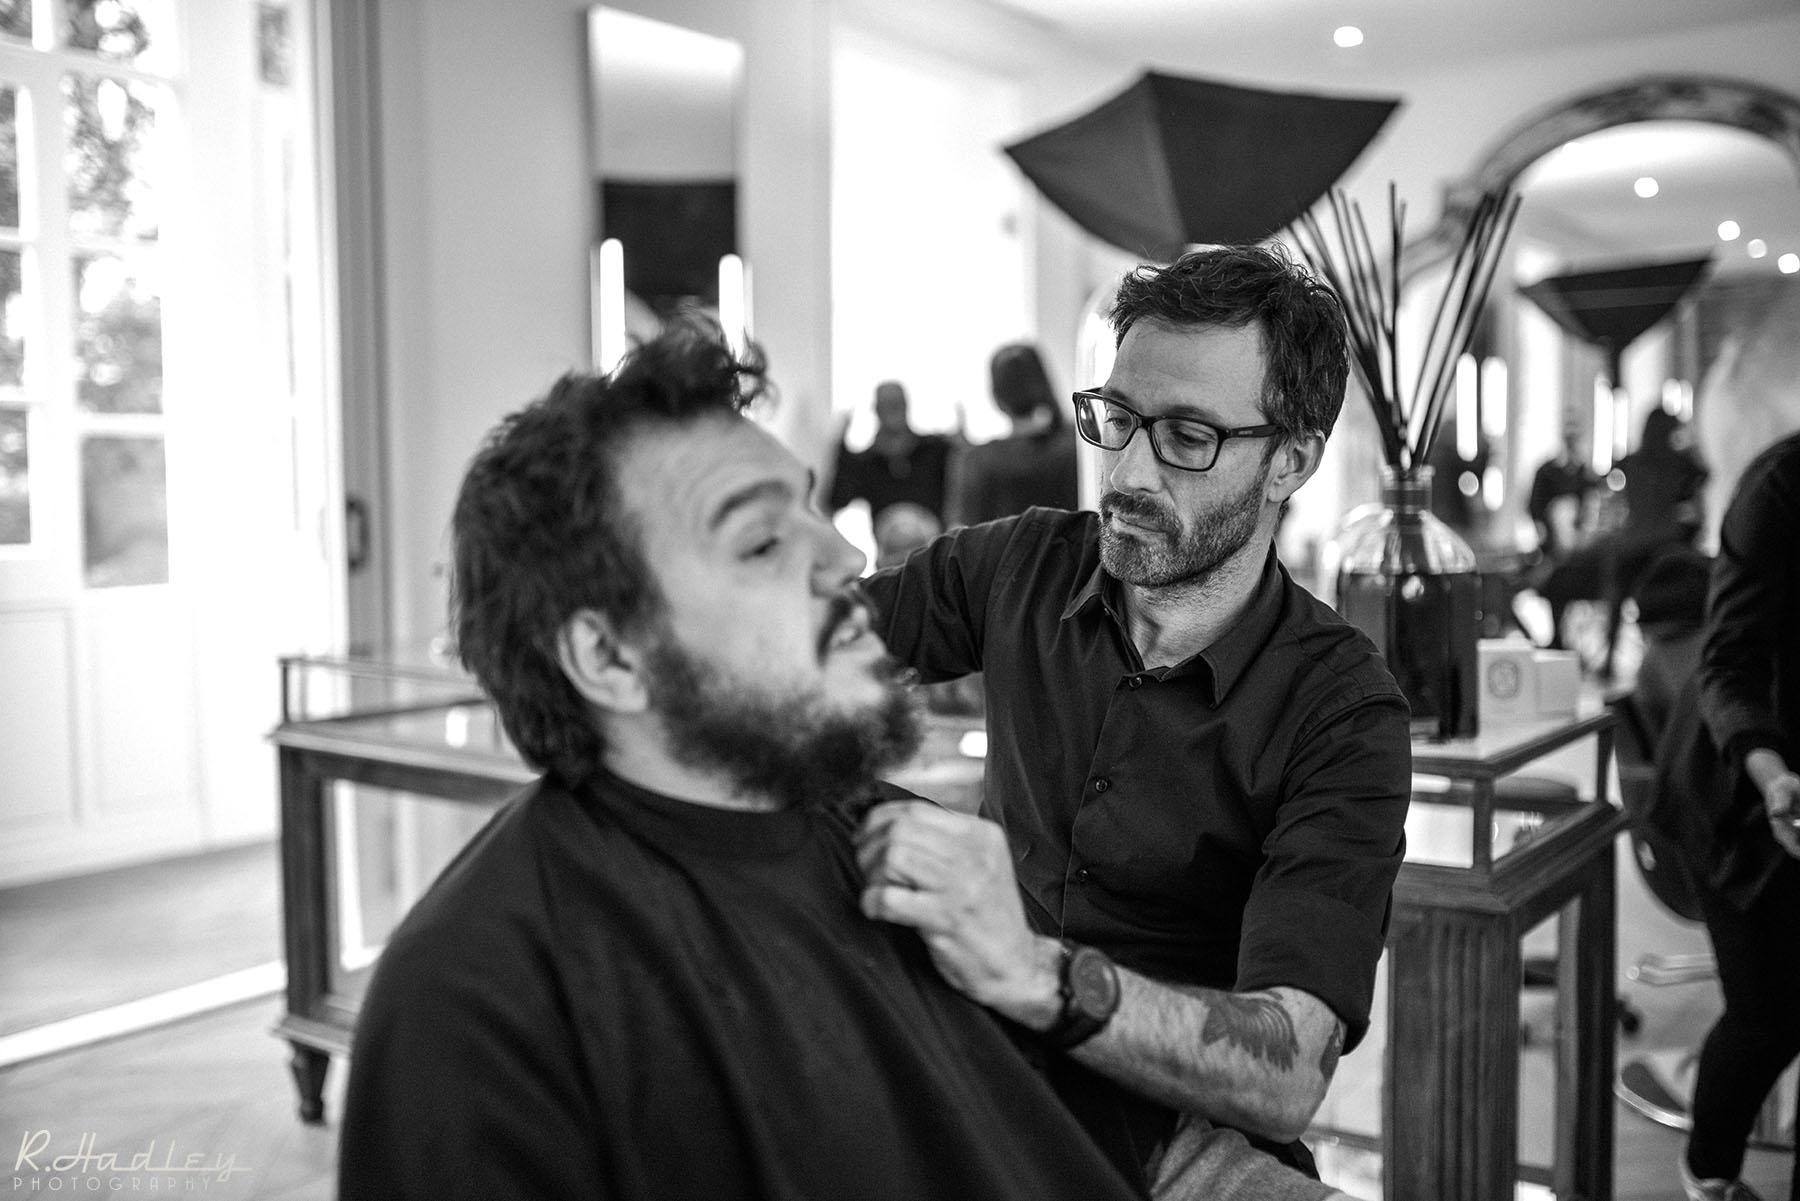 On Set Photographer for Carolina De Santis film production at Salon Toro, Barcelona